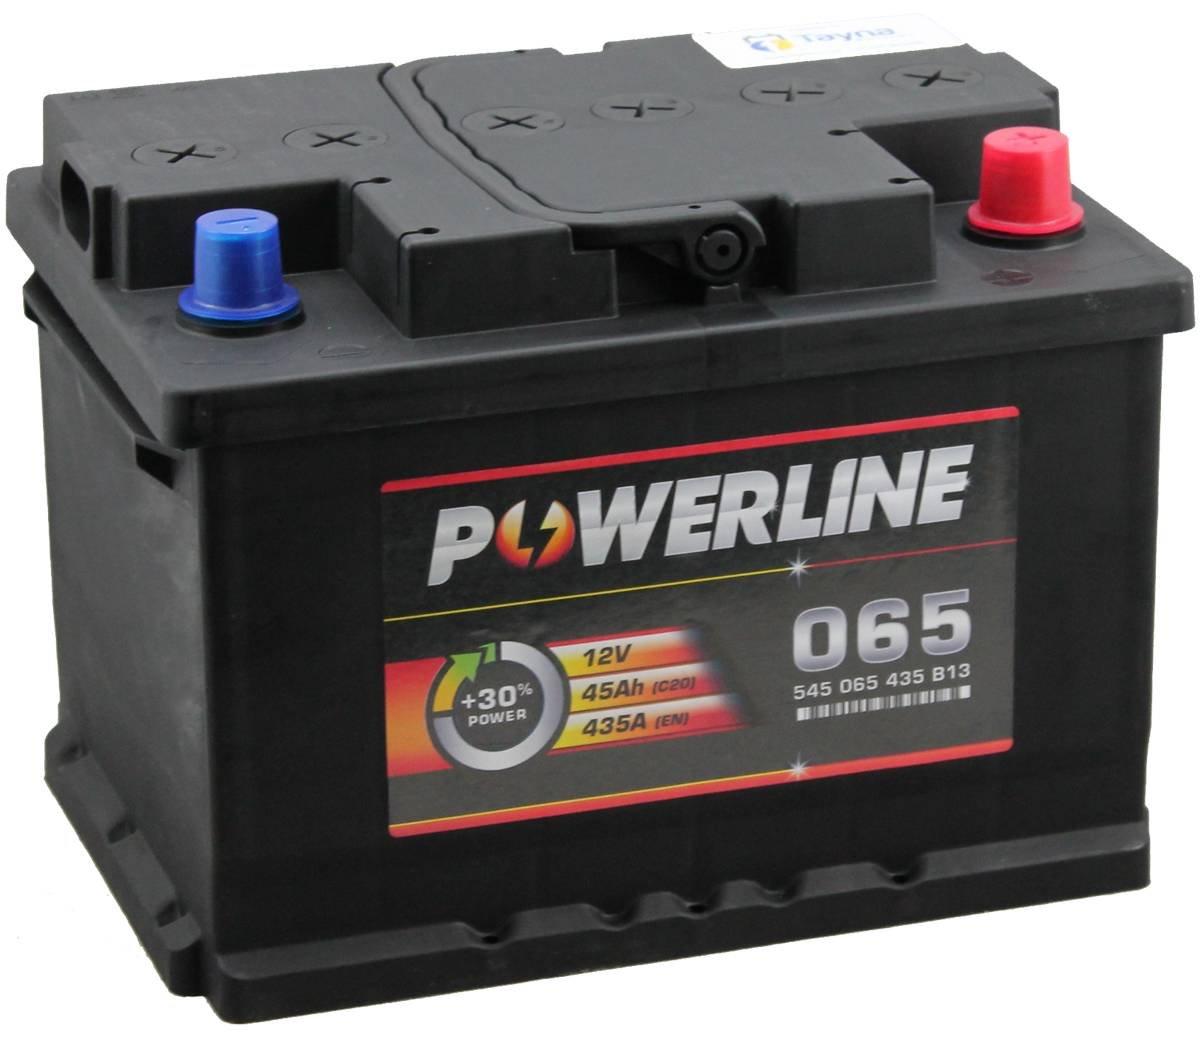 065 Powerline Batterie de Voiture 12V